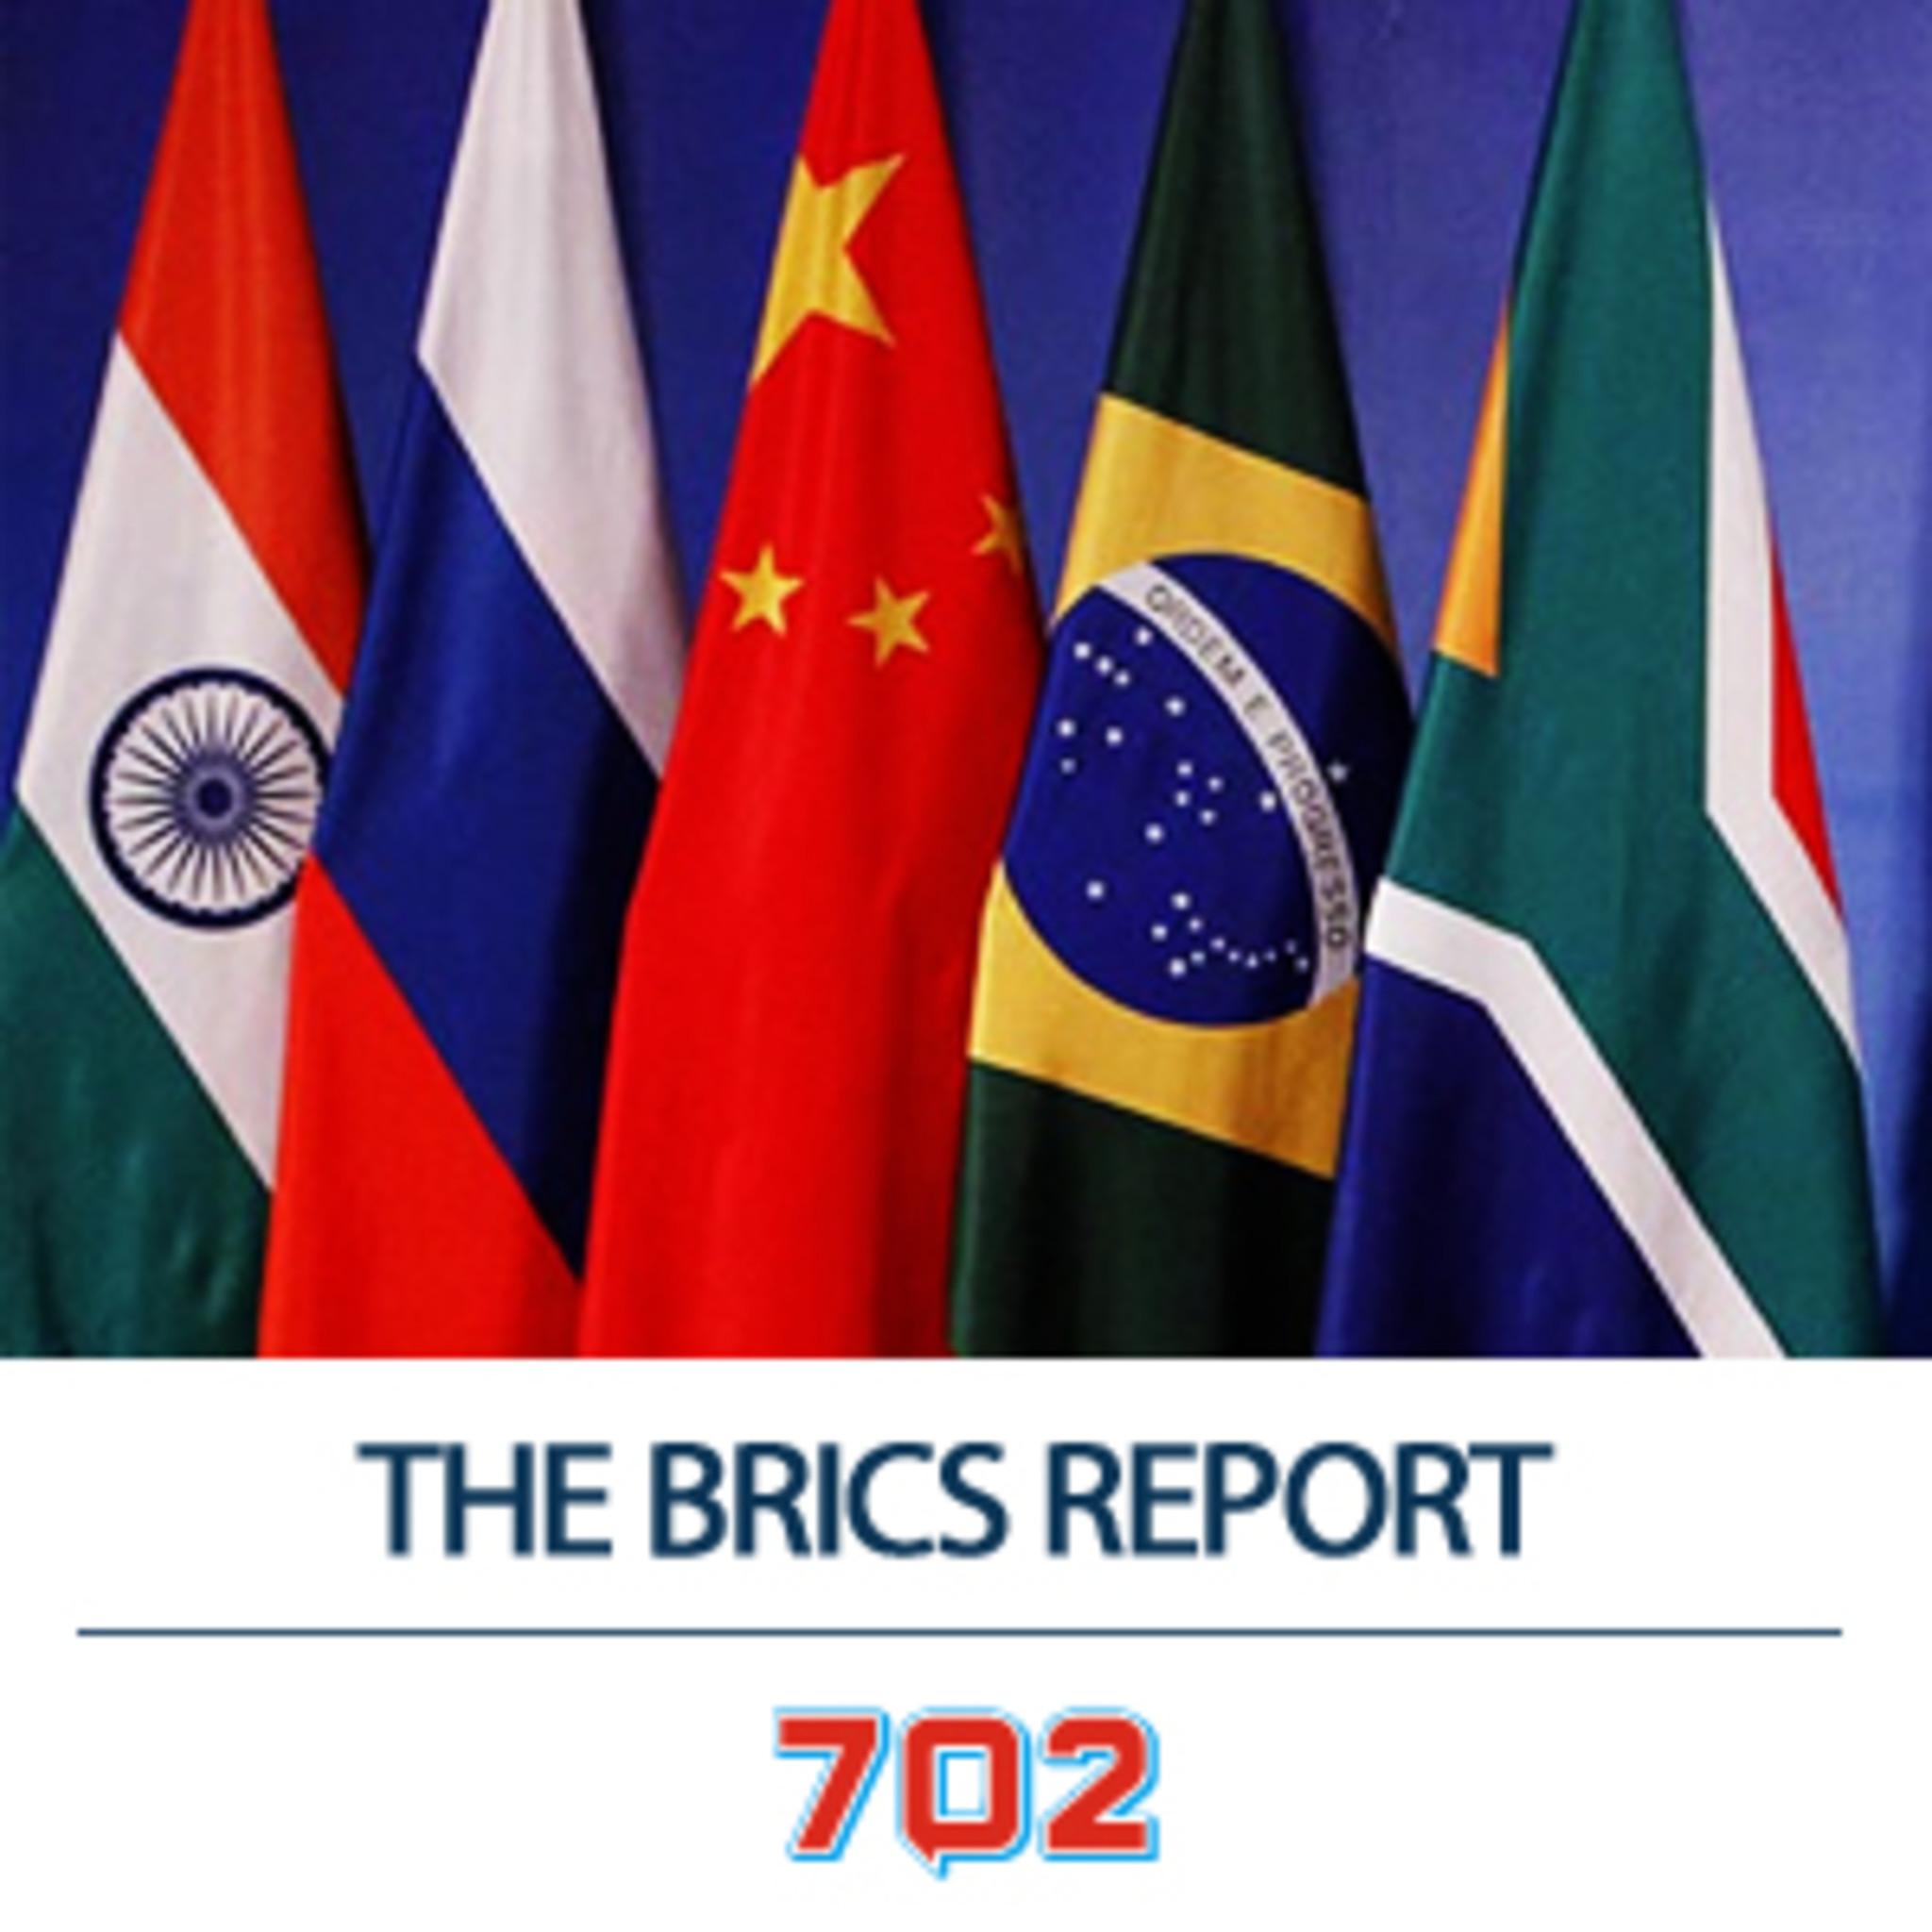 BRICS Report Brazil